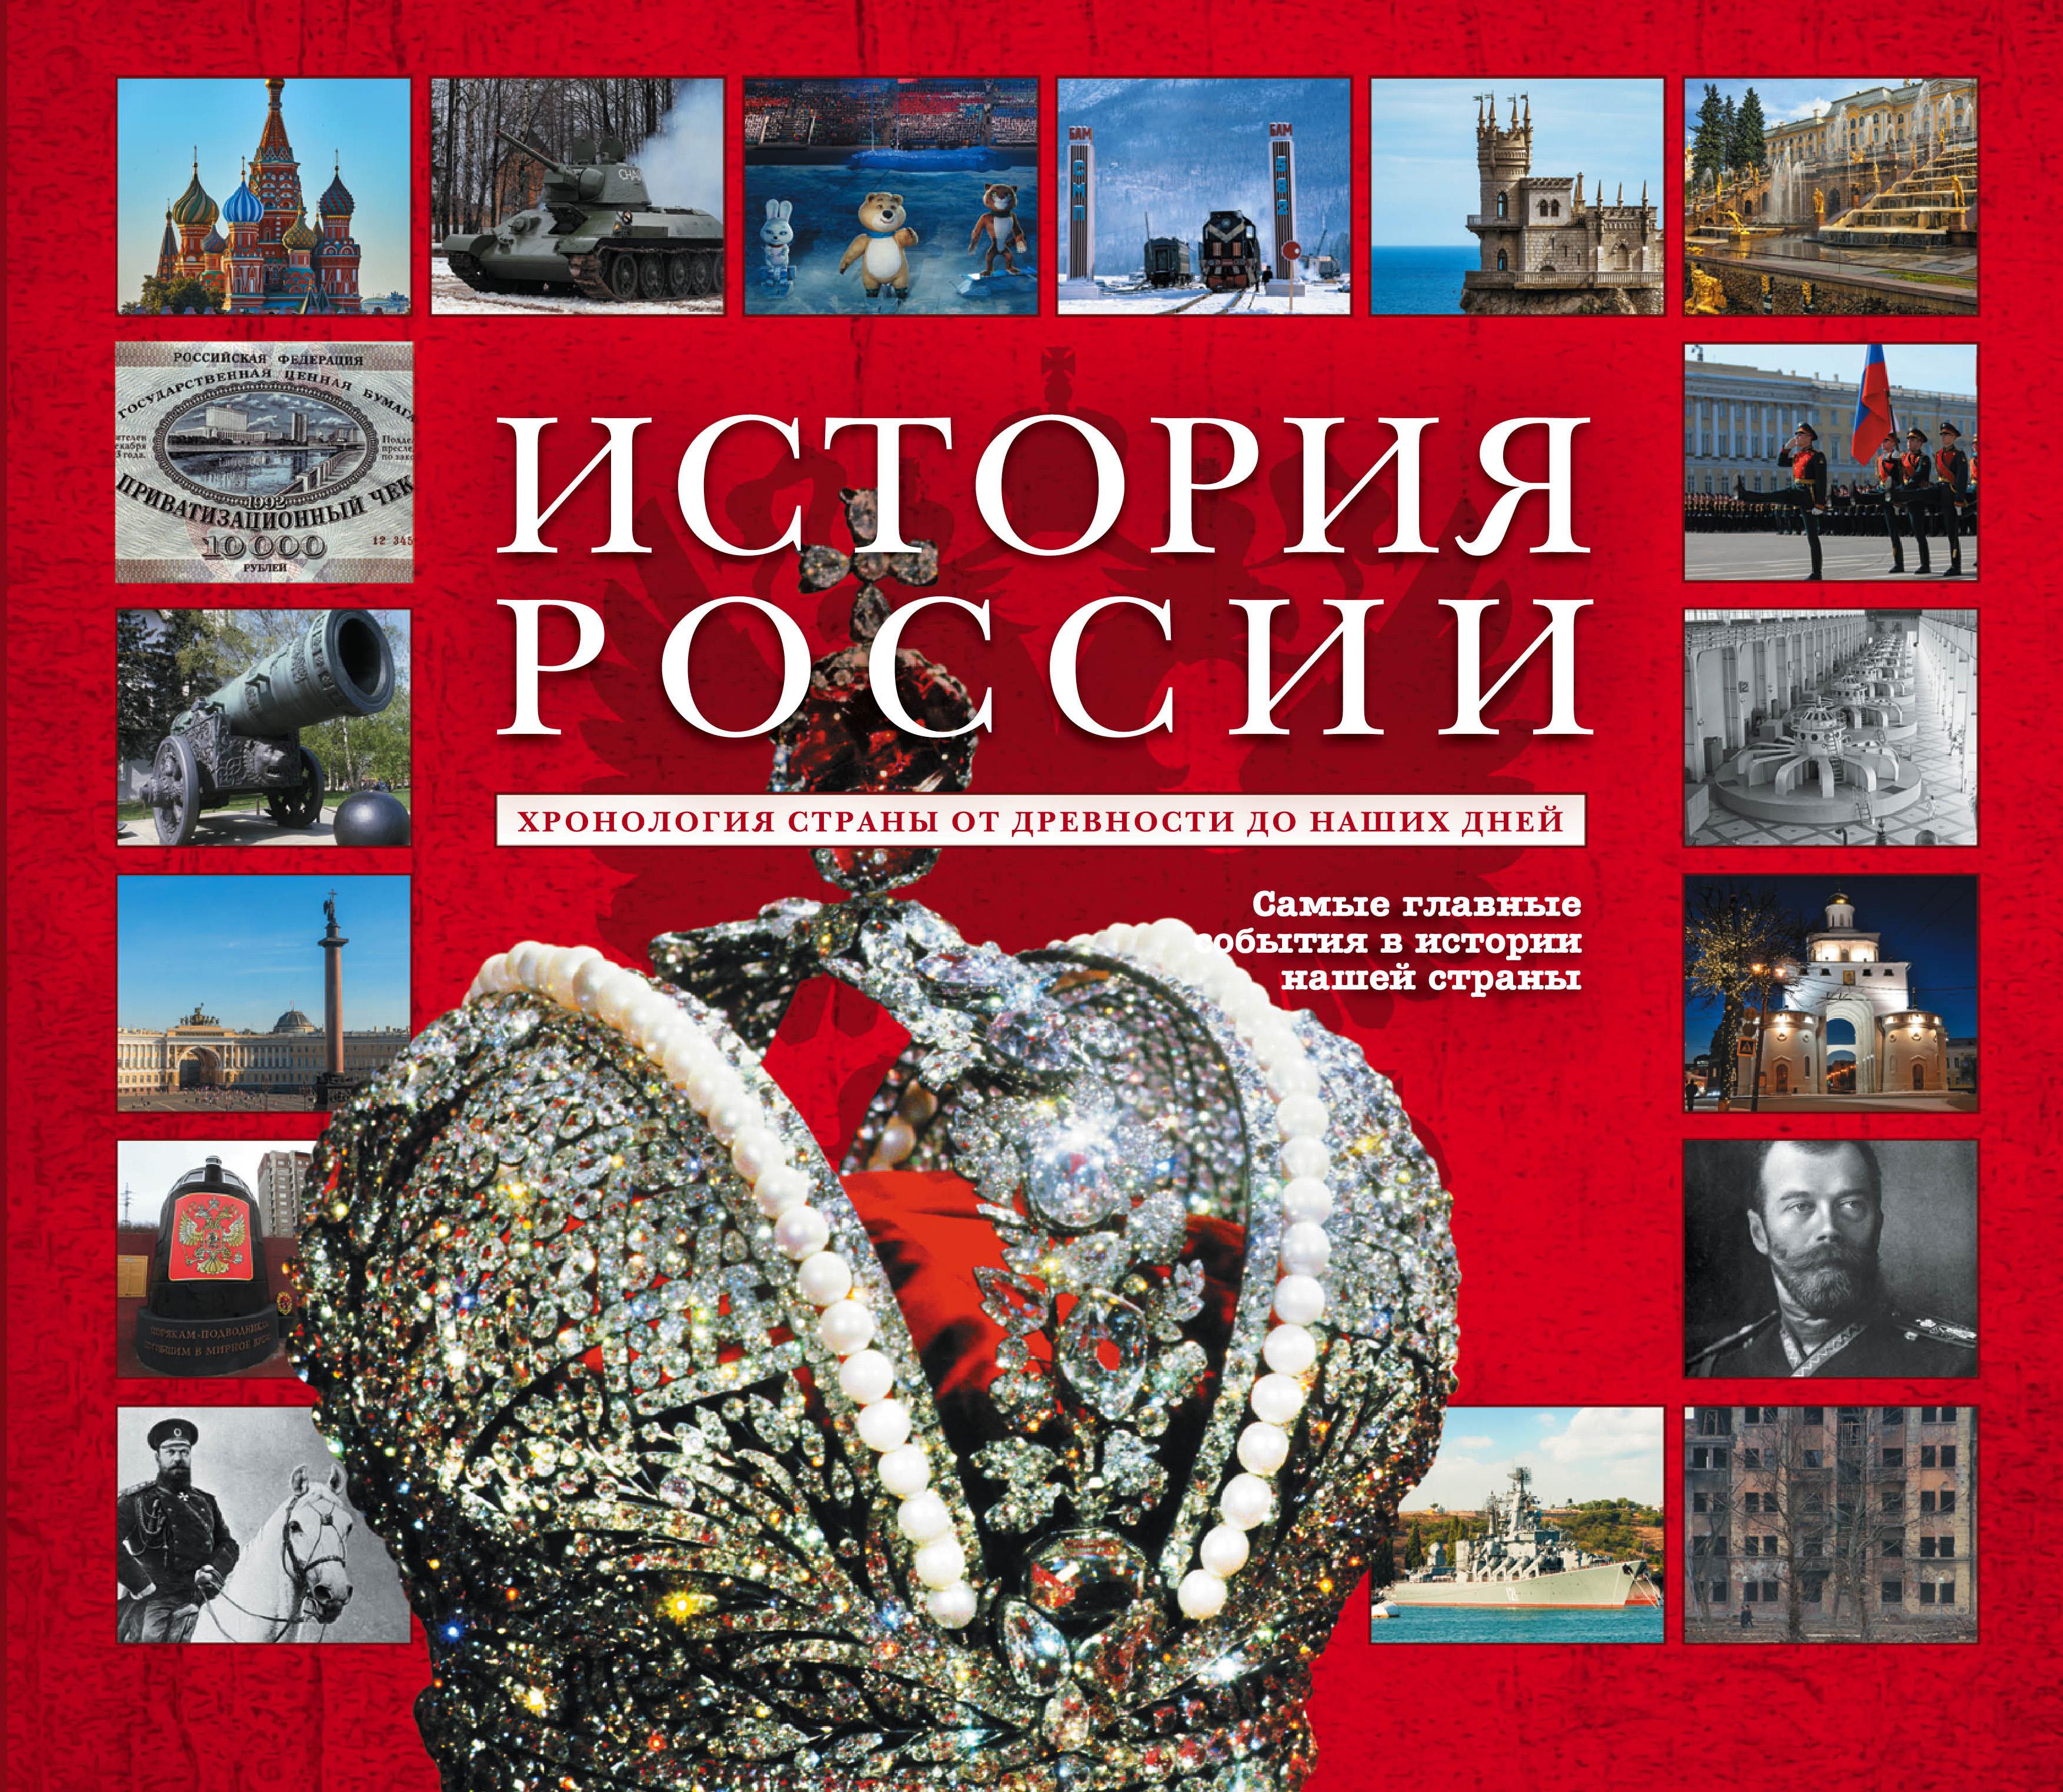 Картинки истории россии, видео